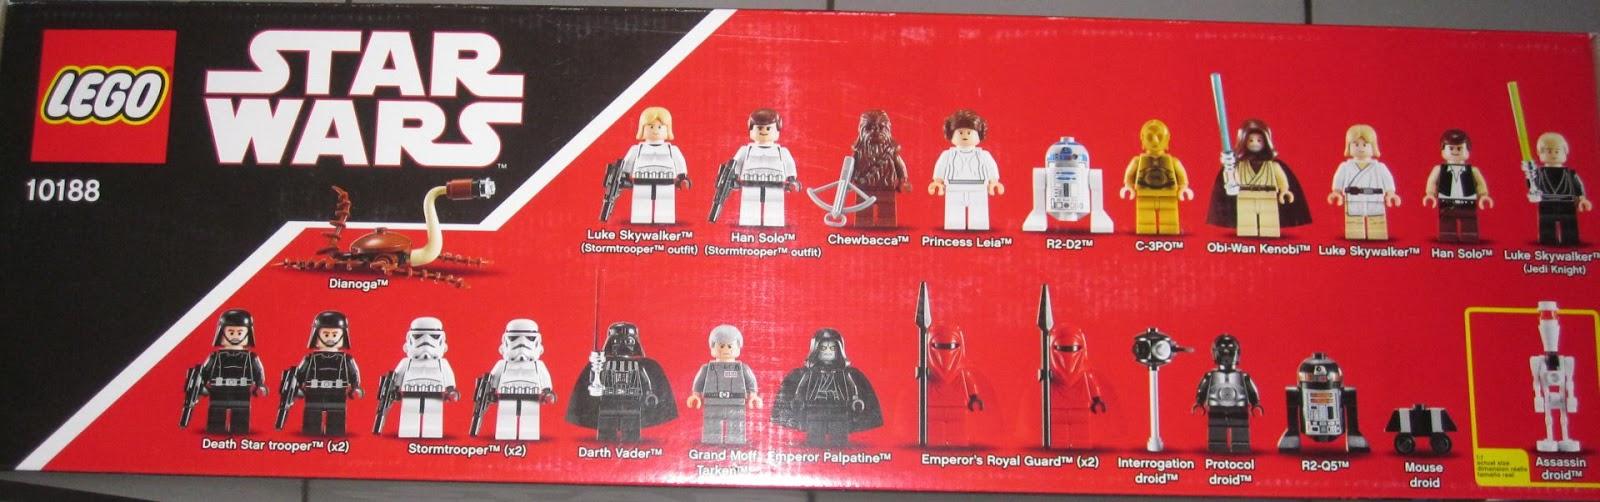 Lego star wars l 39 toile noire - Etoile noire star wars ...